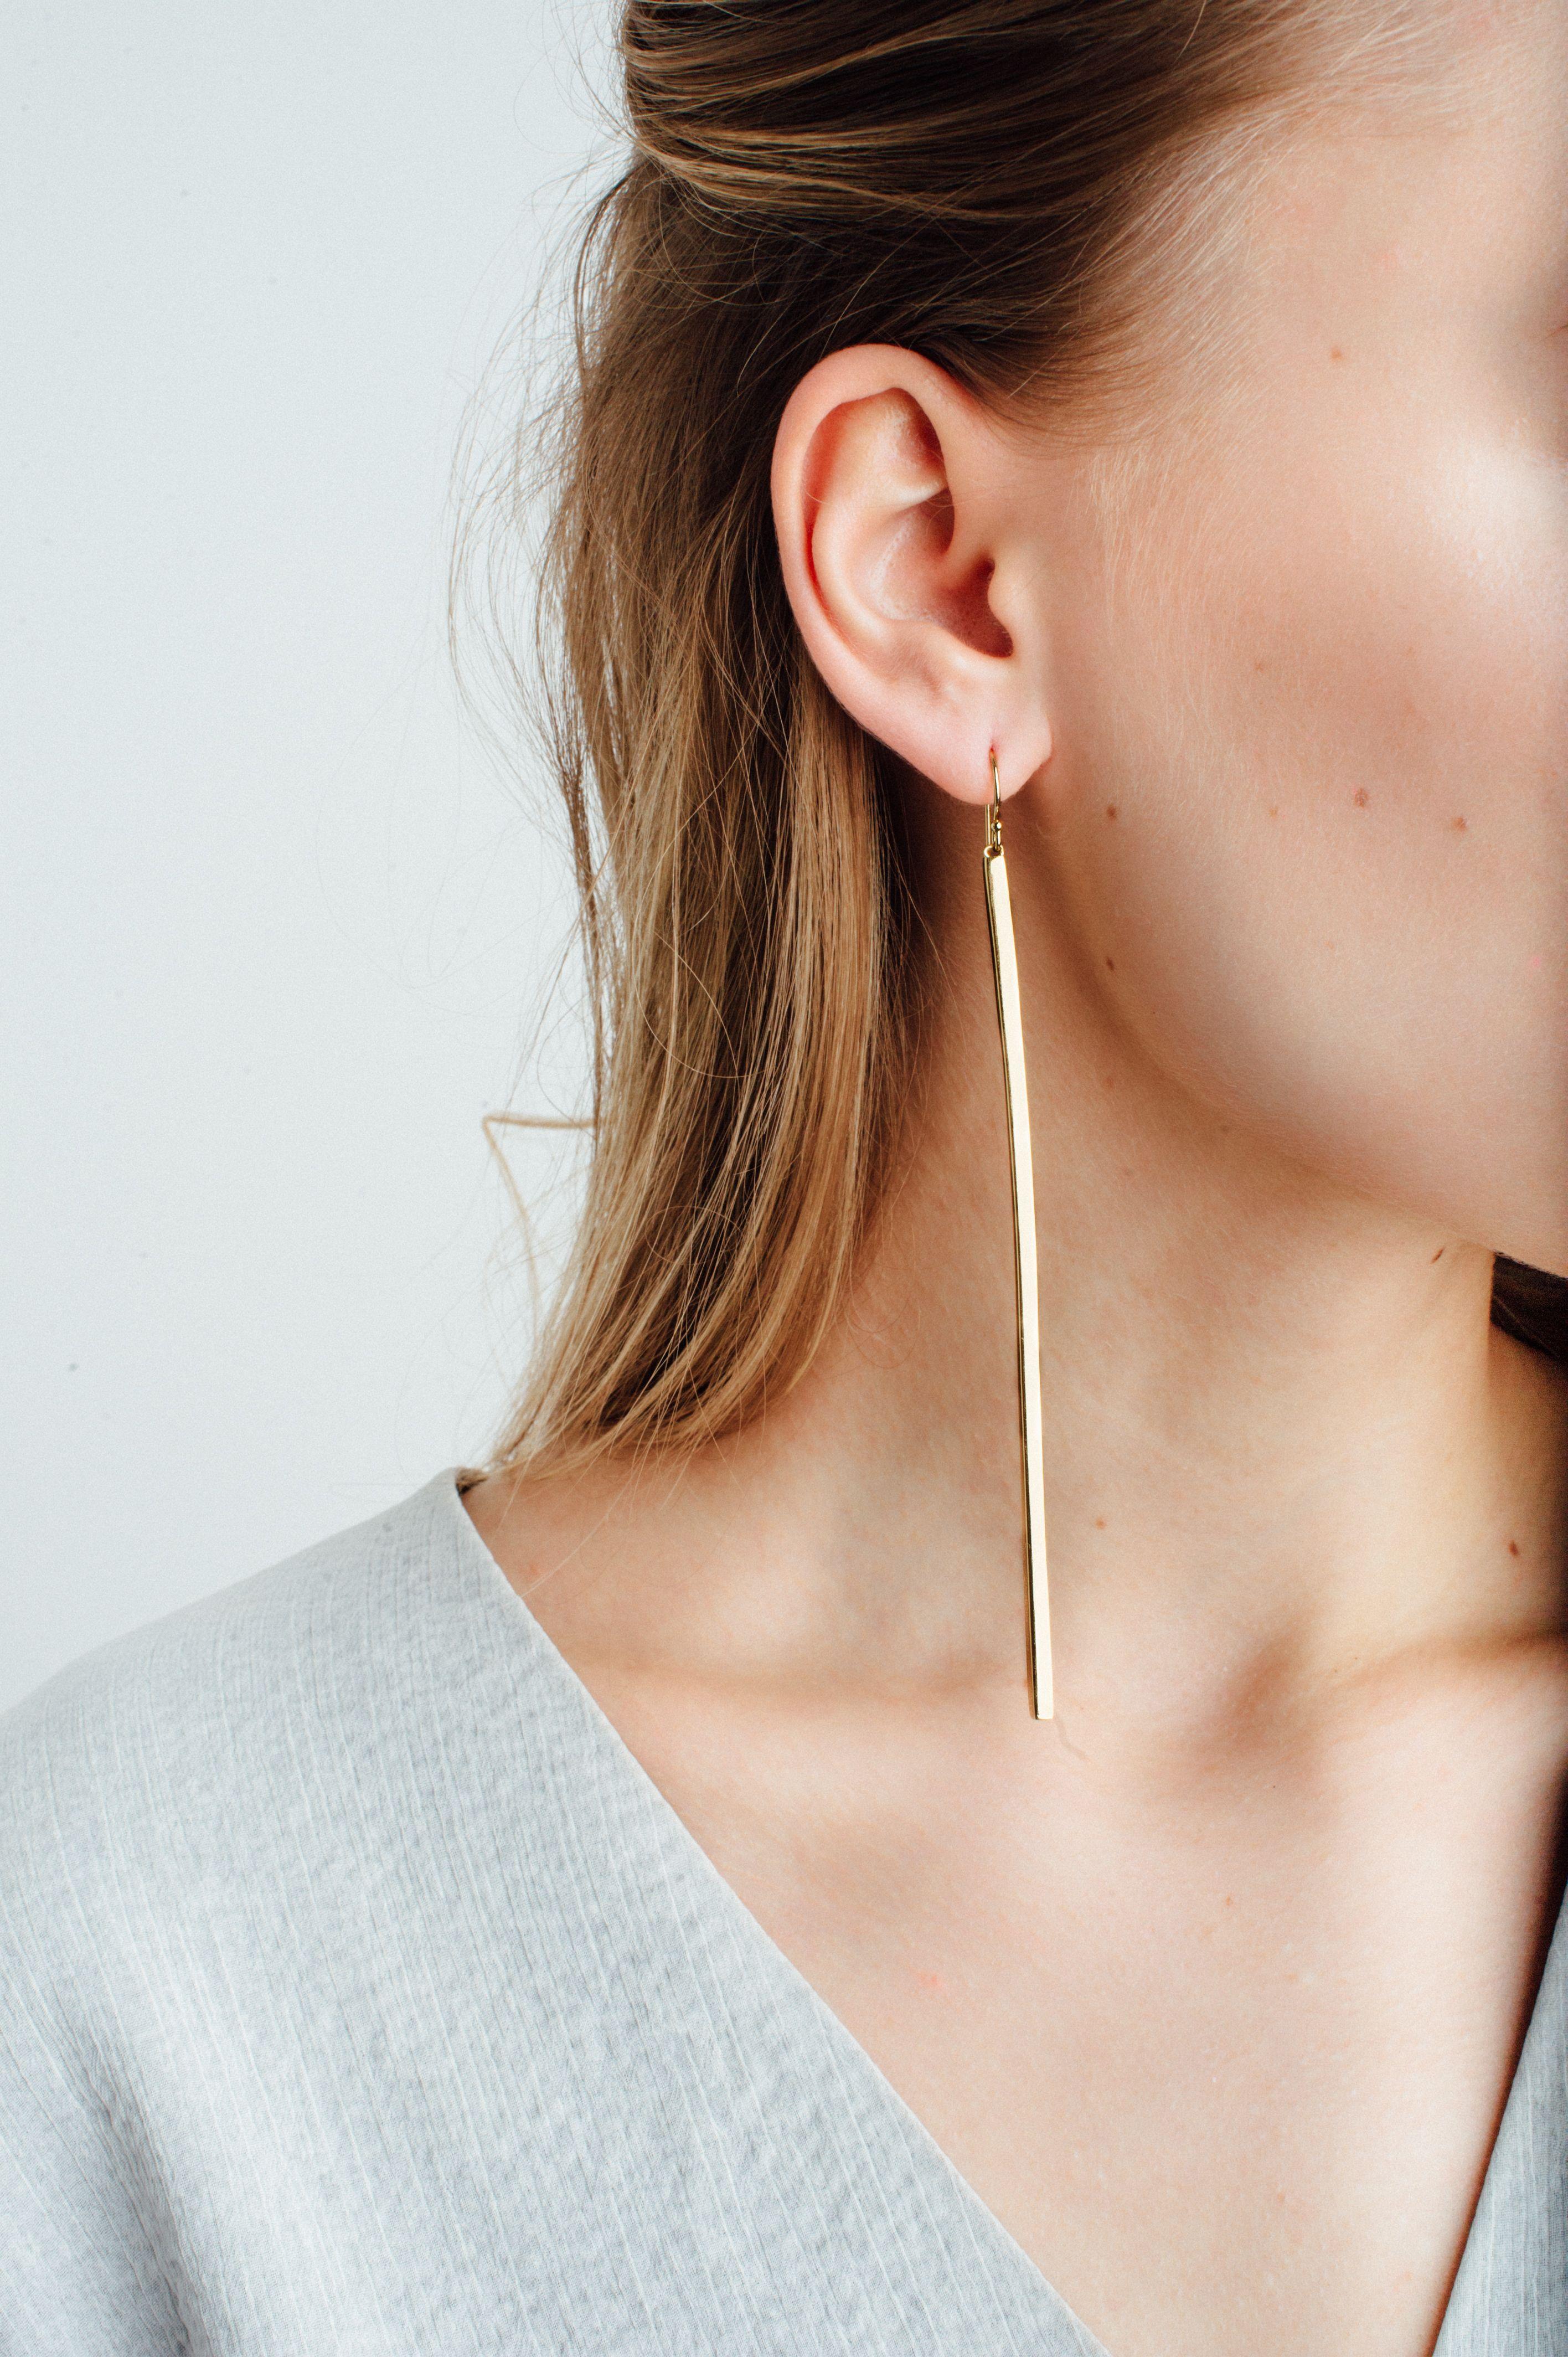 921097bb0 Long Bar Earrings in 2019 | Editions | Bar earrings, Gold bar ...